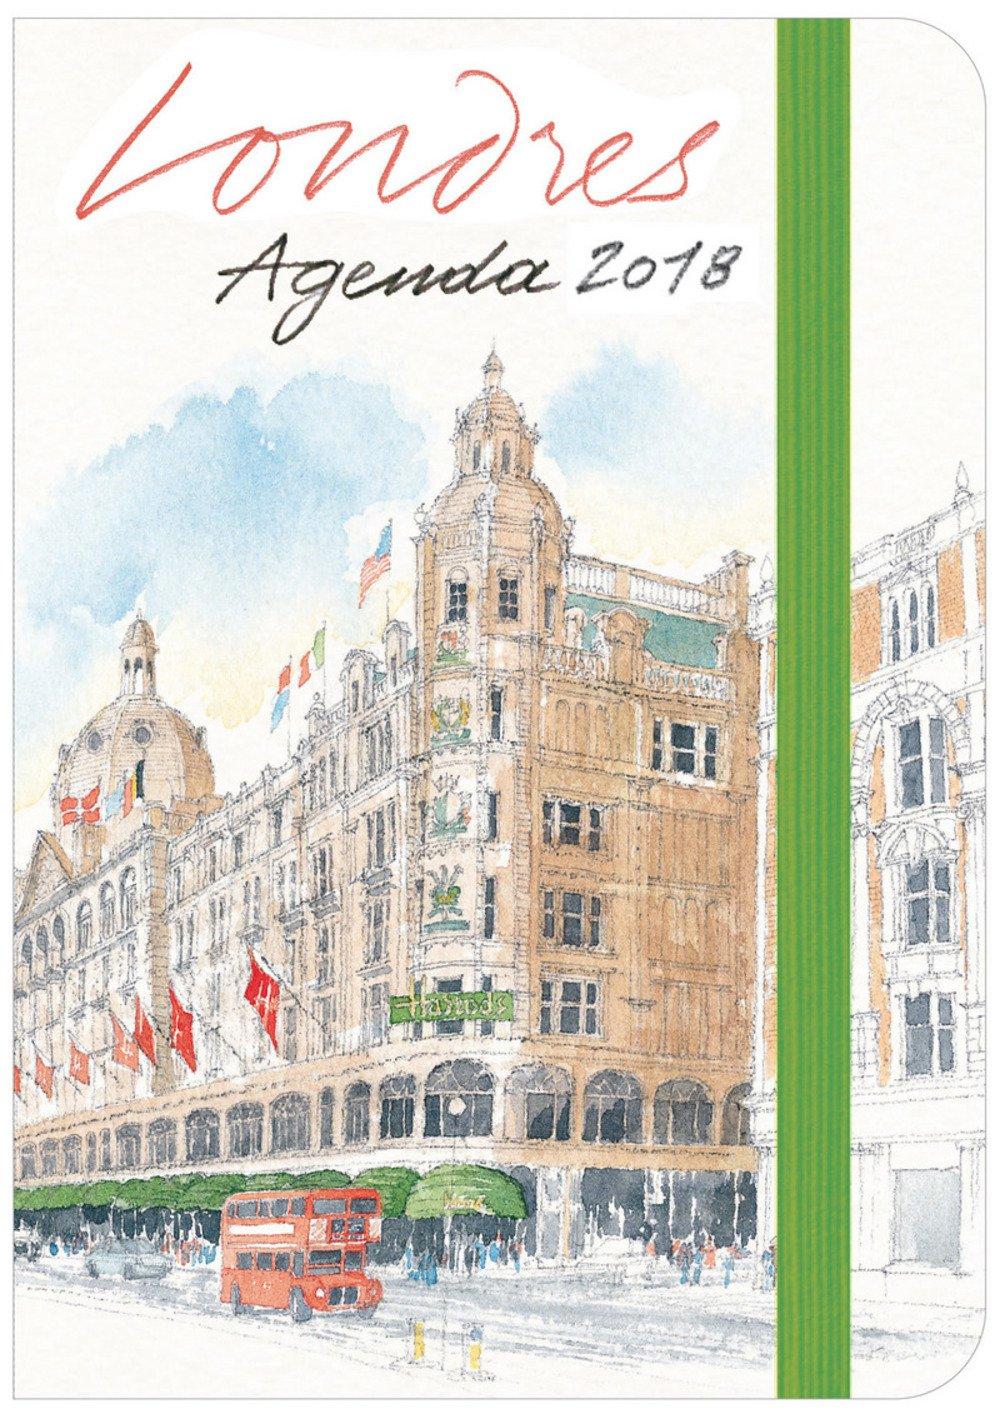 Agenda Londres aquarelles: 9782878682144: Amazon.com: Books